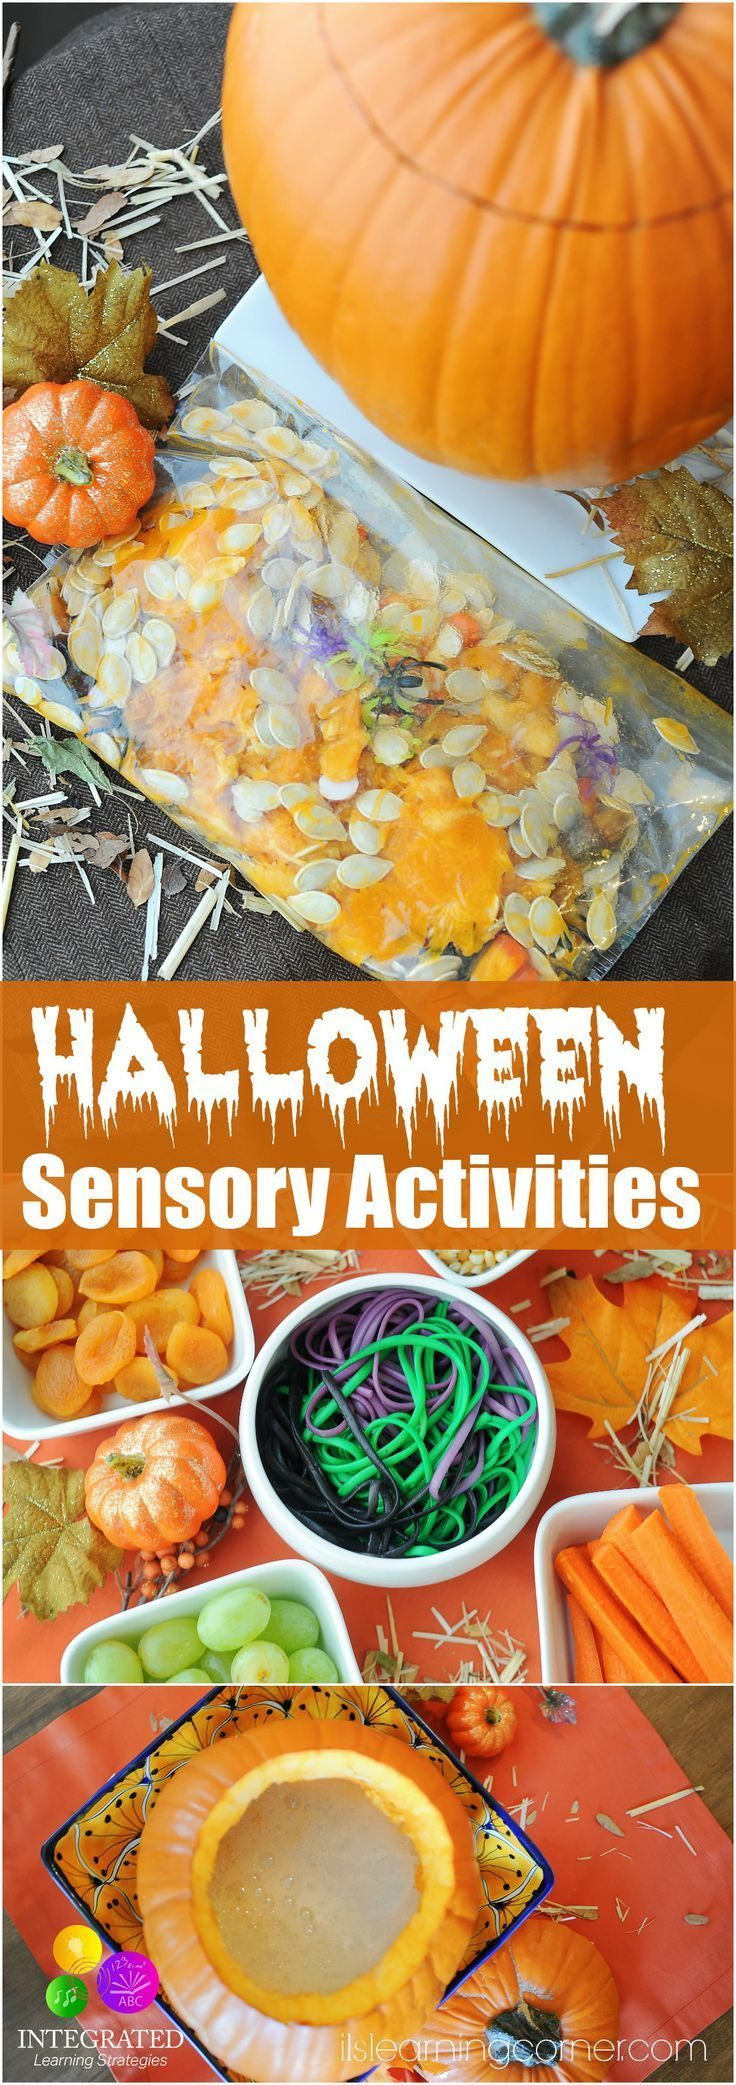 """Ghoulish"" Halloween Sensory Activities to Calm Sensory Sensitivity | ilslearningcorner.com #sensoryactivities #sensoryplay"